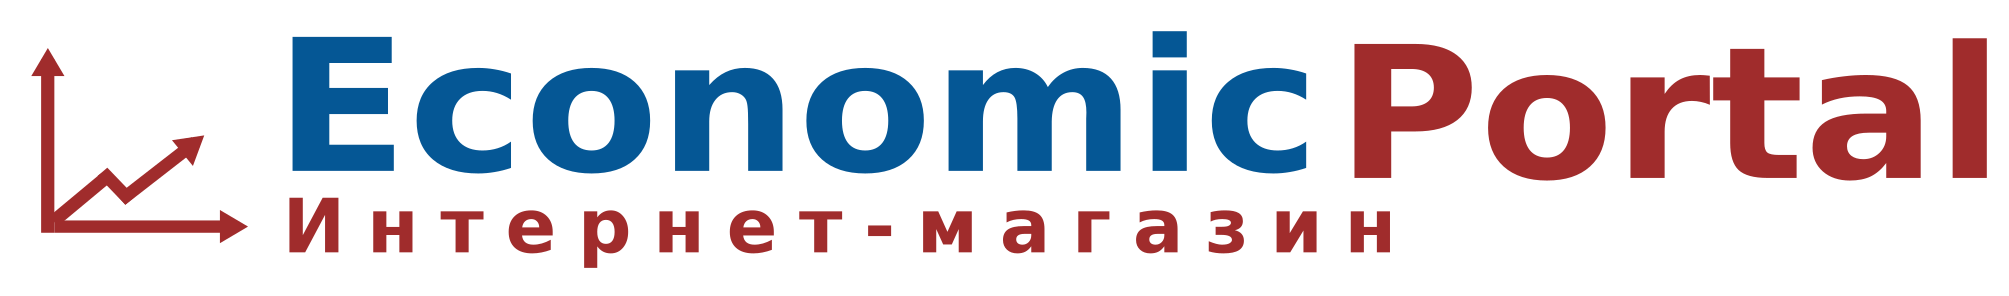 Интернет-магазин Economicportal.ru